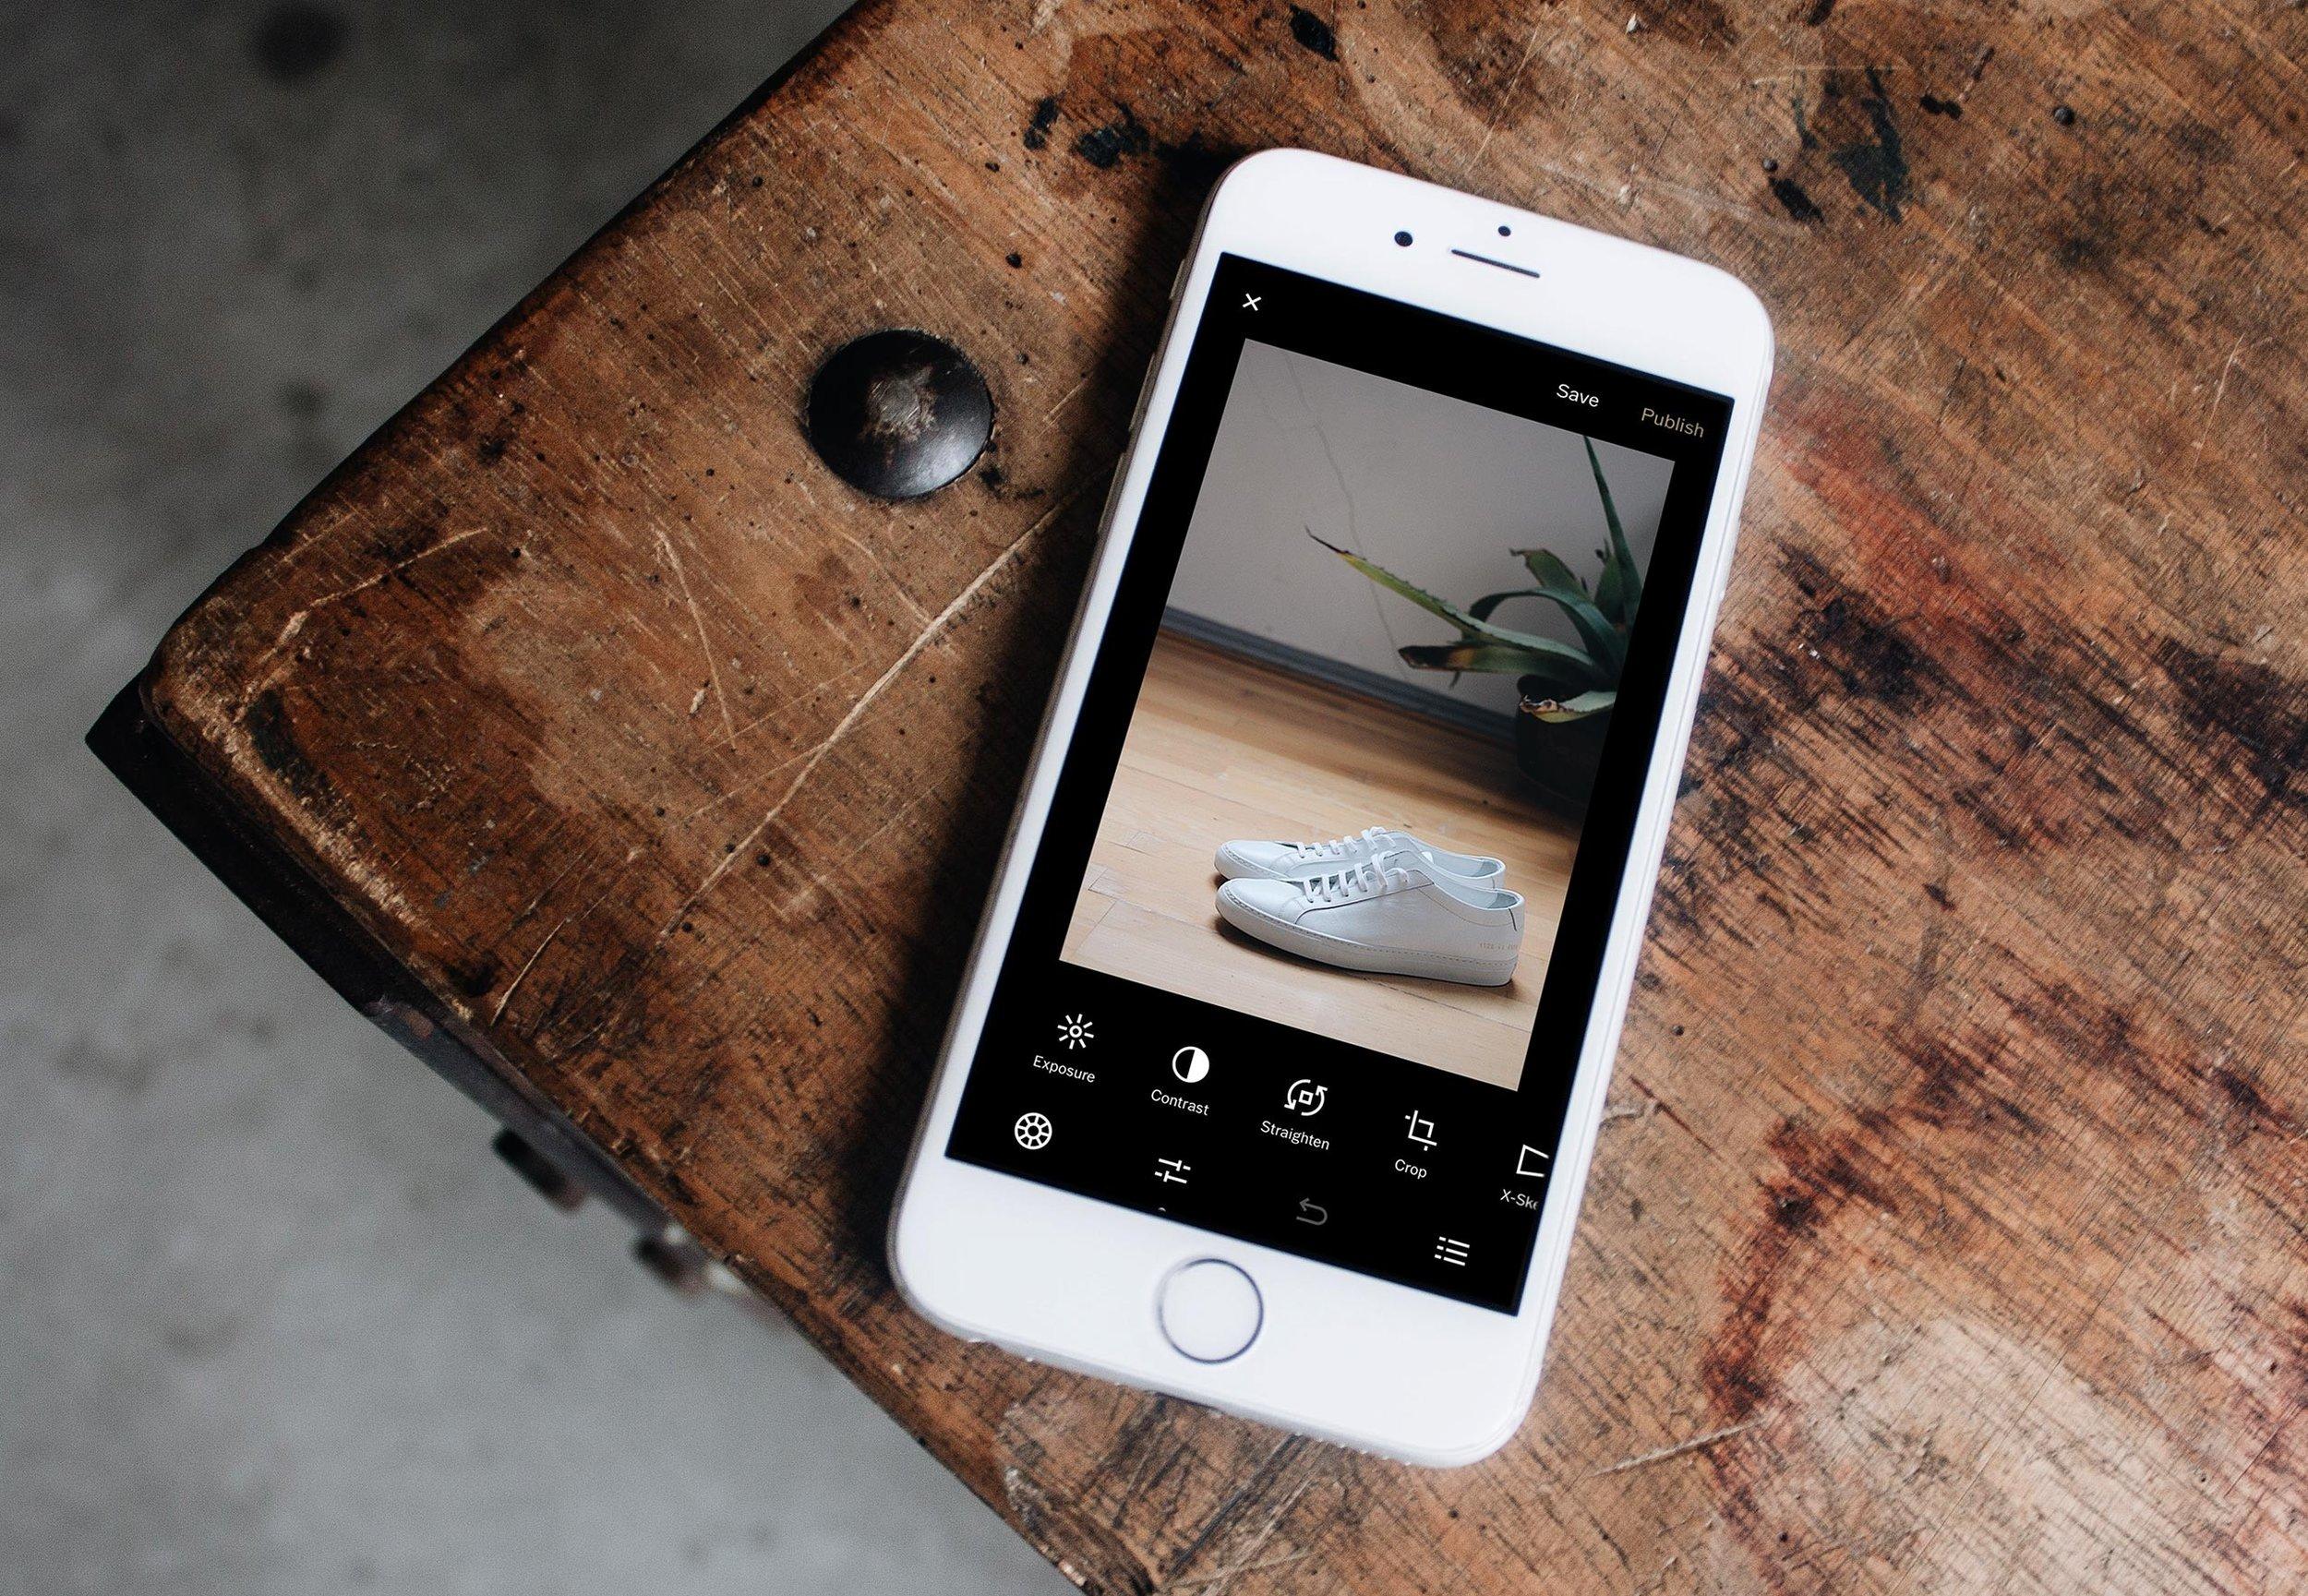 VSCO Cam photography app